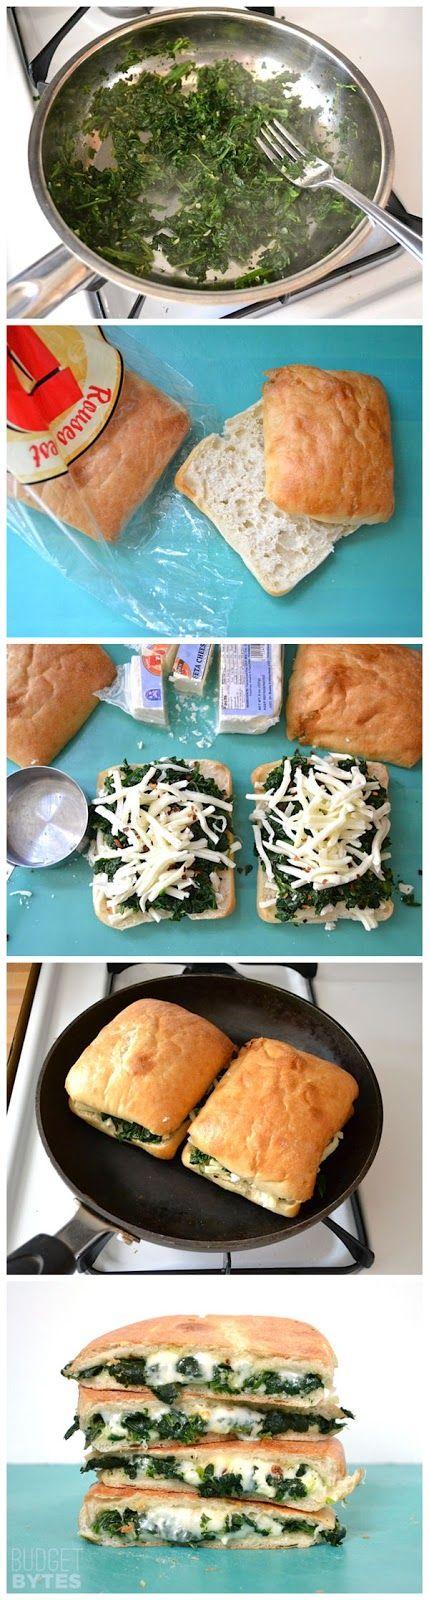 Spinach Feta GrilledCheese Sandwich